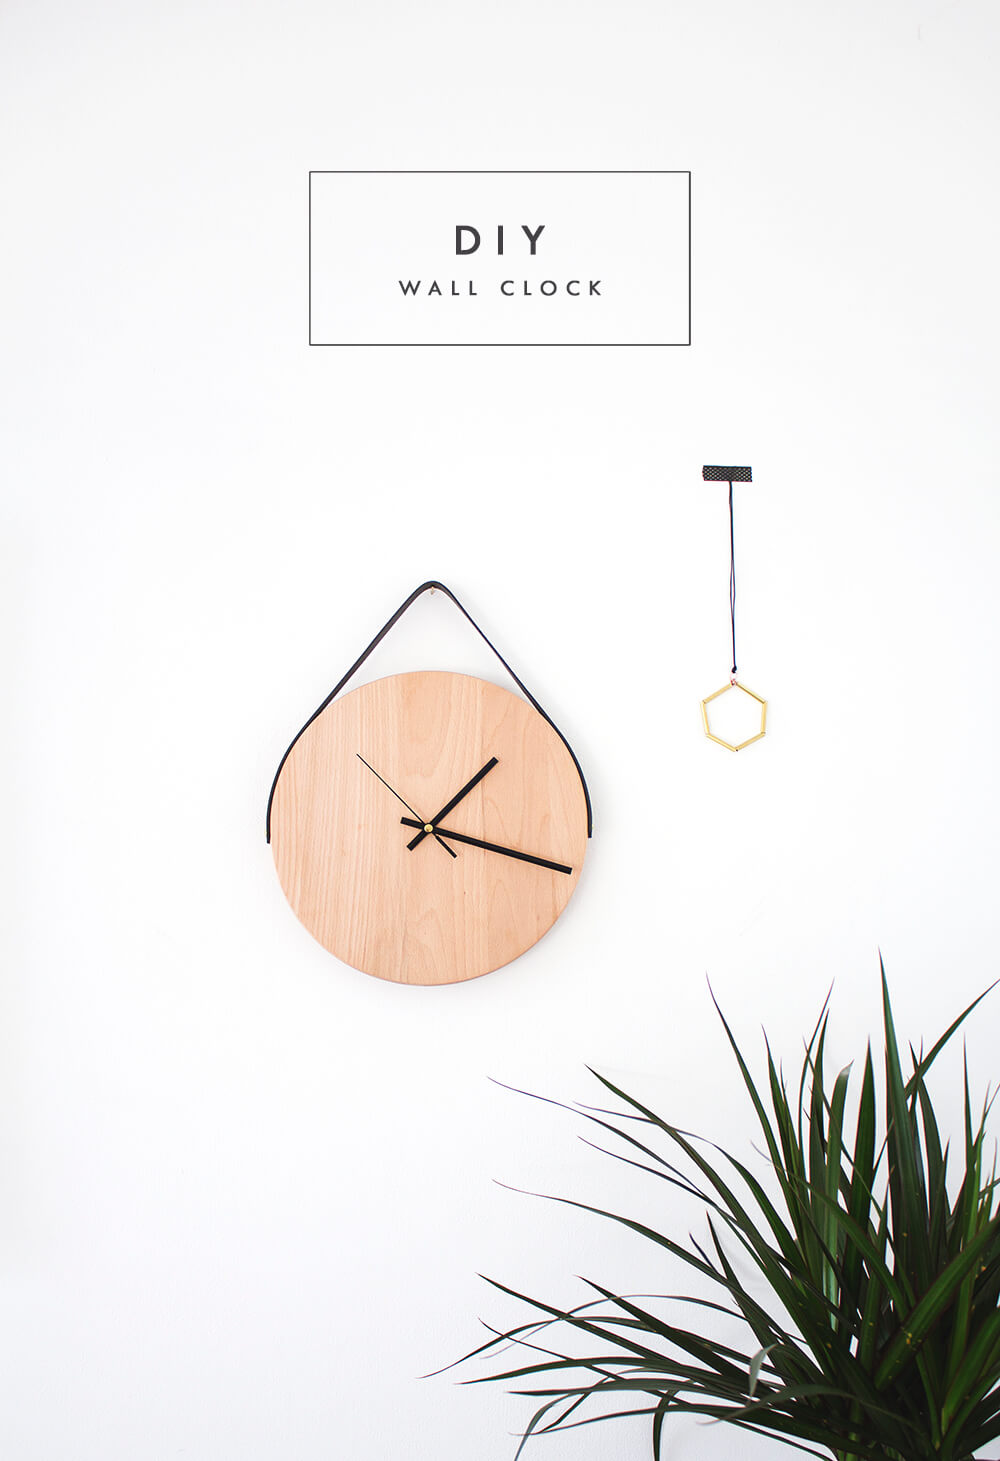 Wooden DIY Wall Clock Ideas